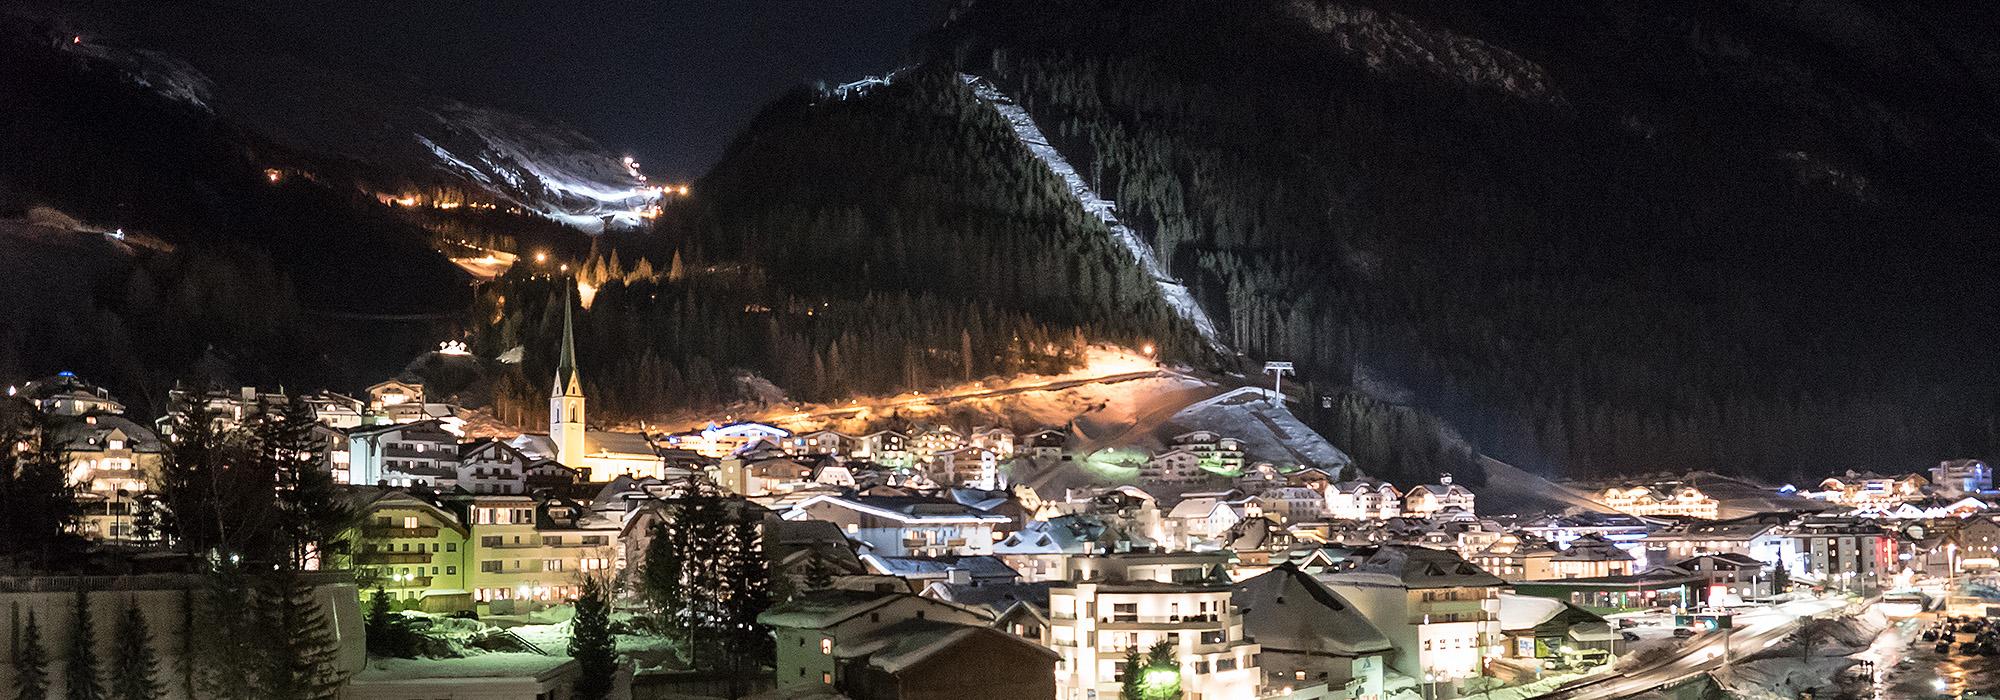 Hotel Garni Lamtana Ischgl Tirol | Anfragen